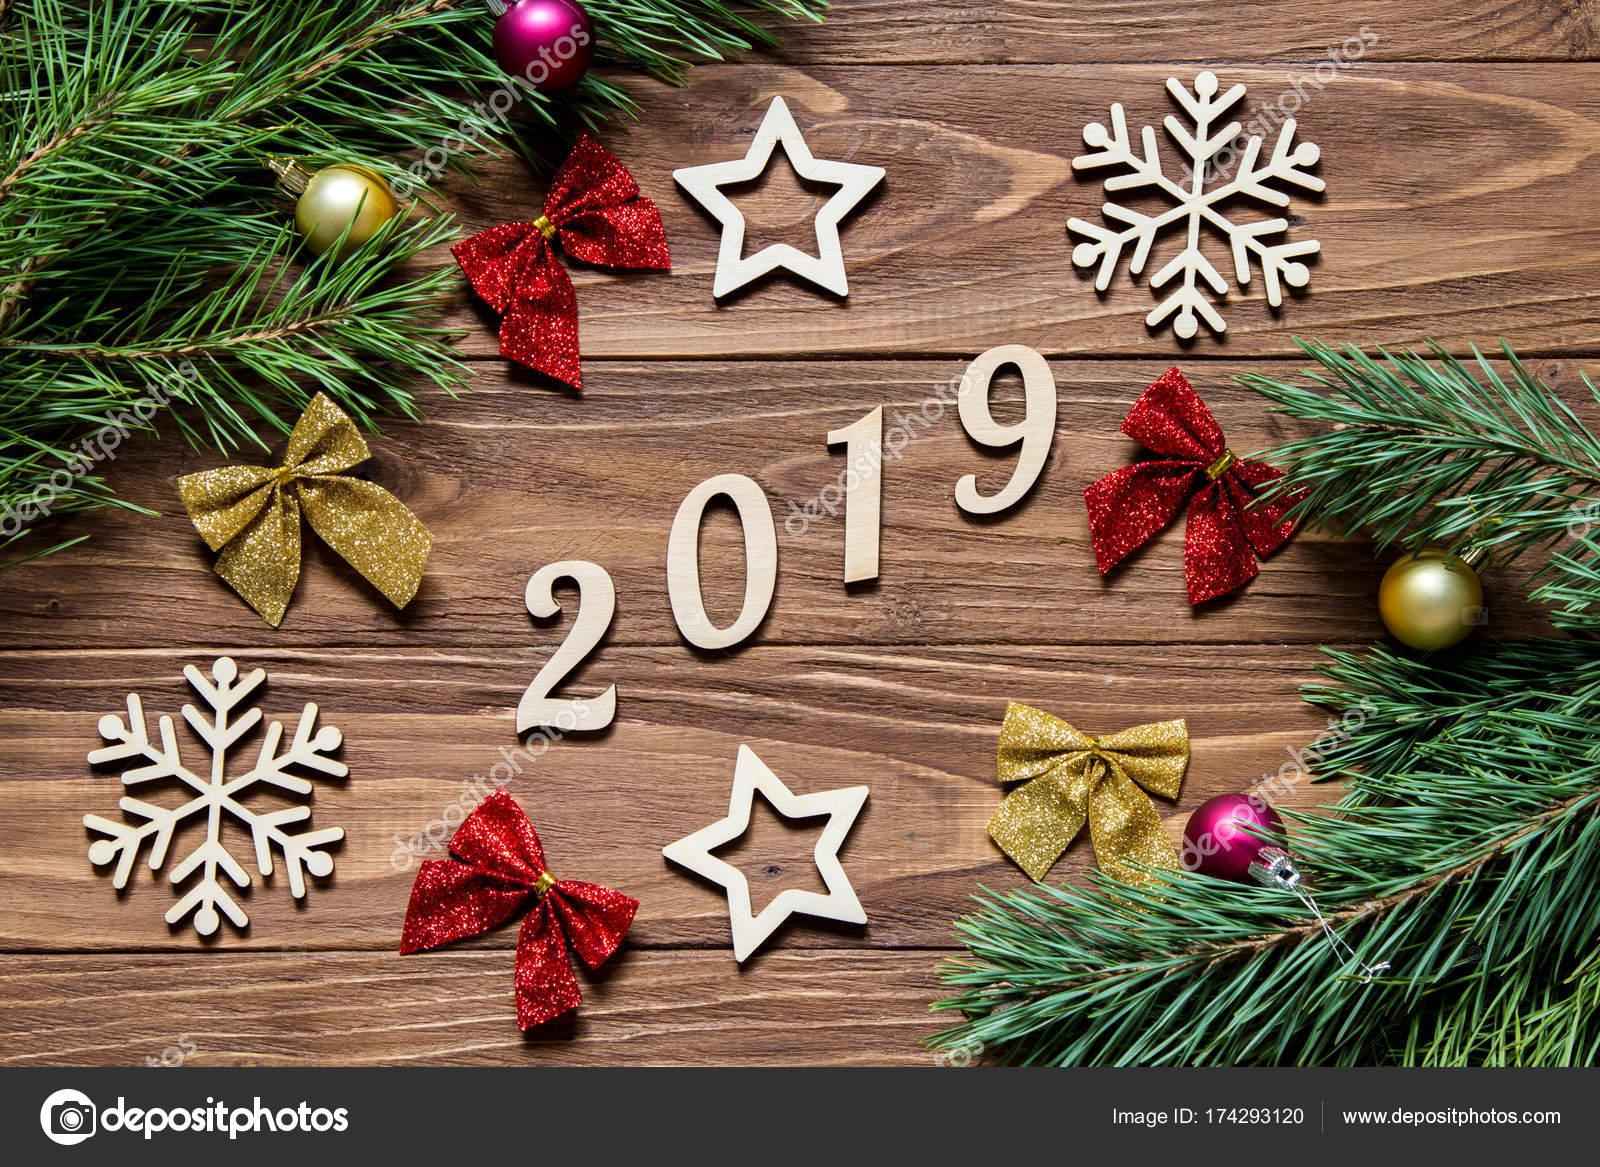 Decorazioni Natalizie Tavola 2019.Originale Esposizione Di Decorazione Di Natale Sulla Tavola